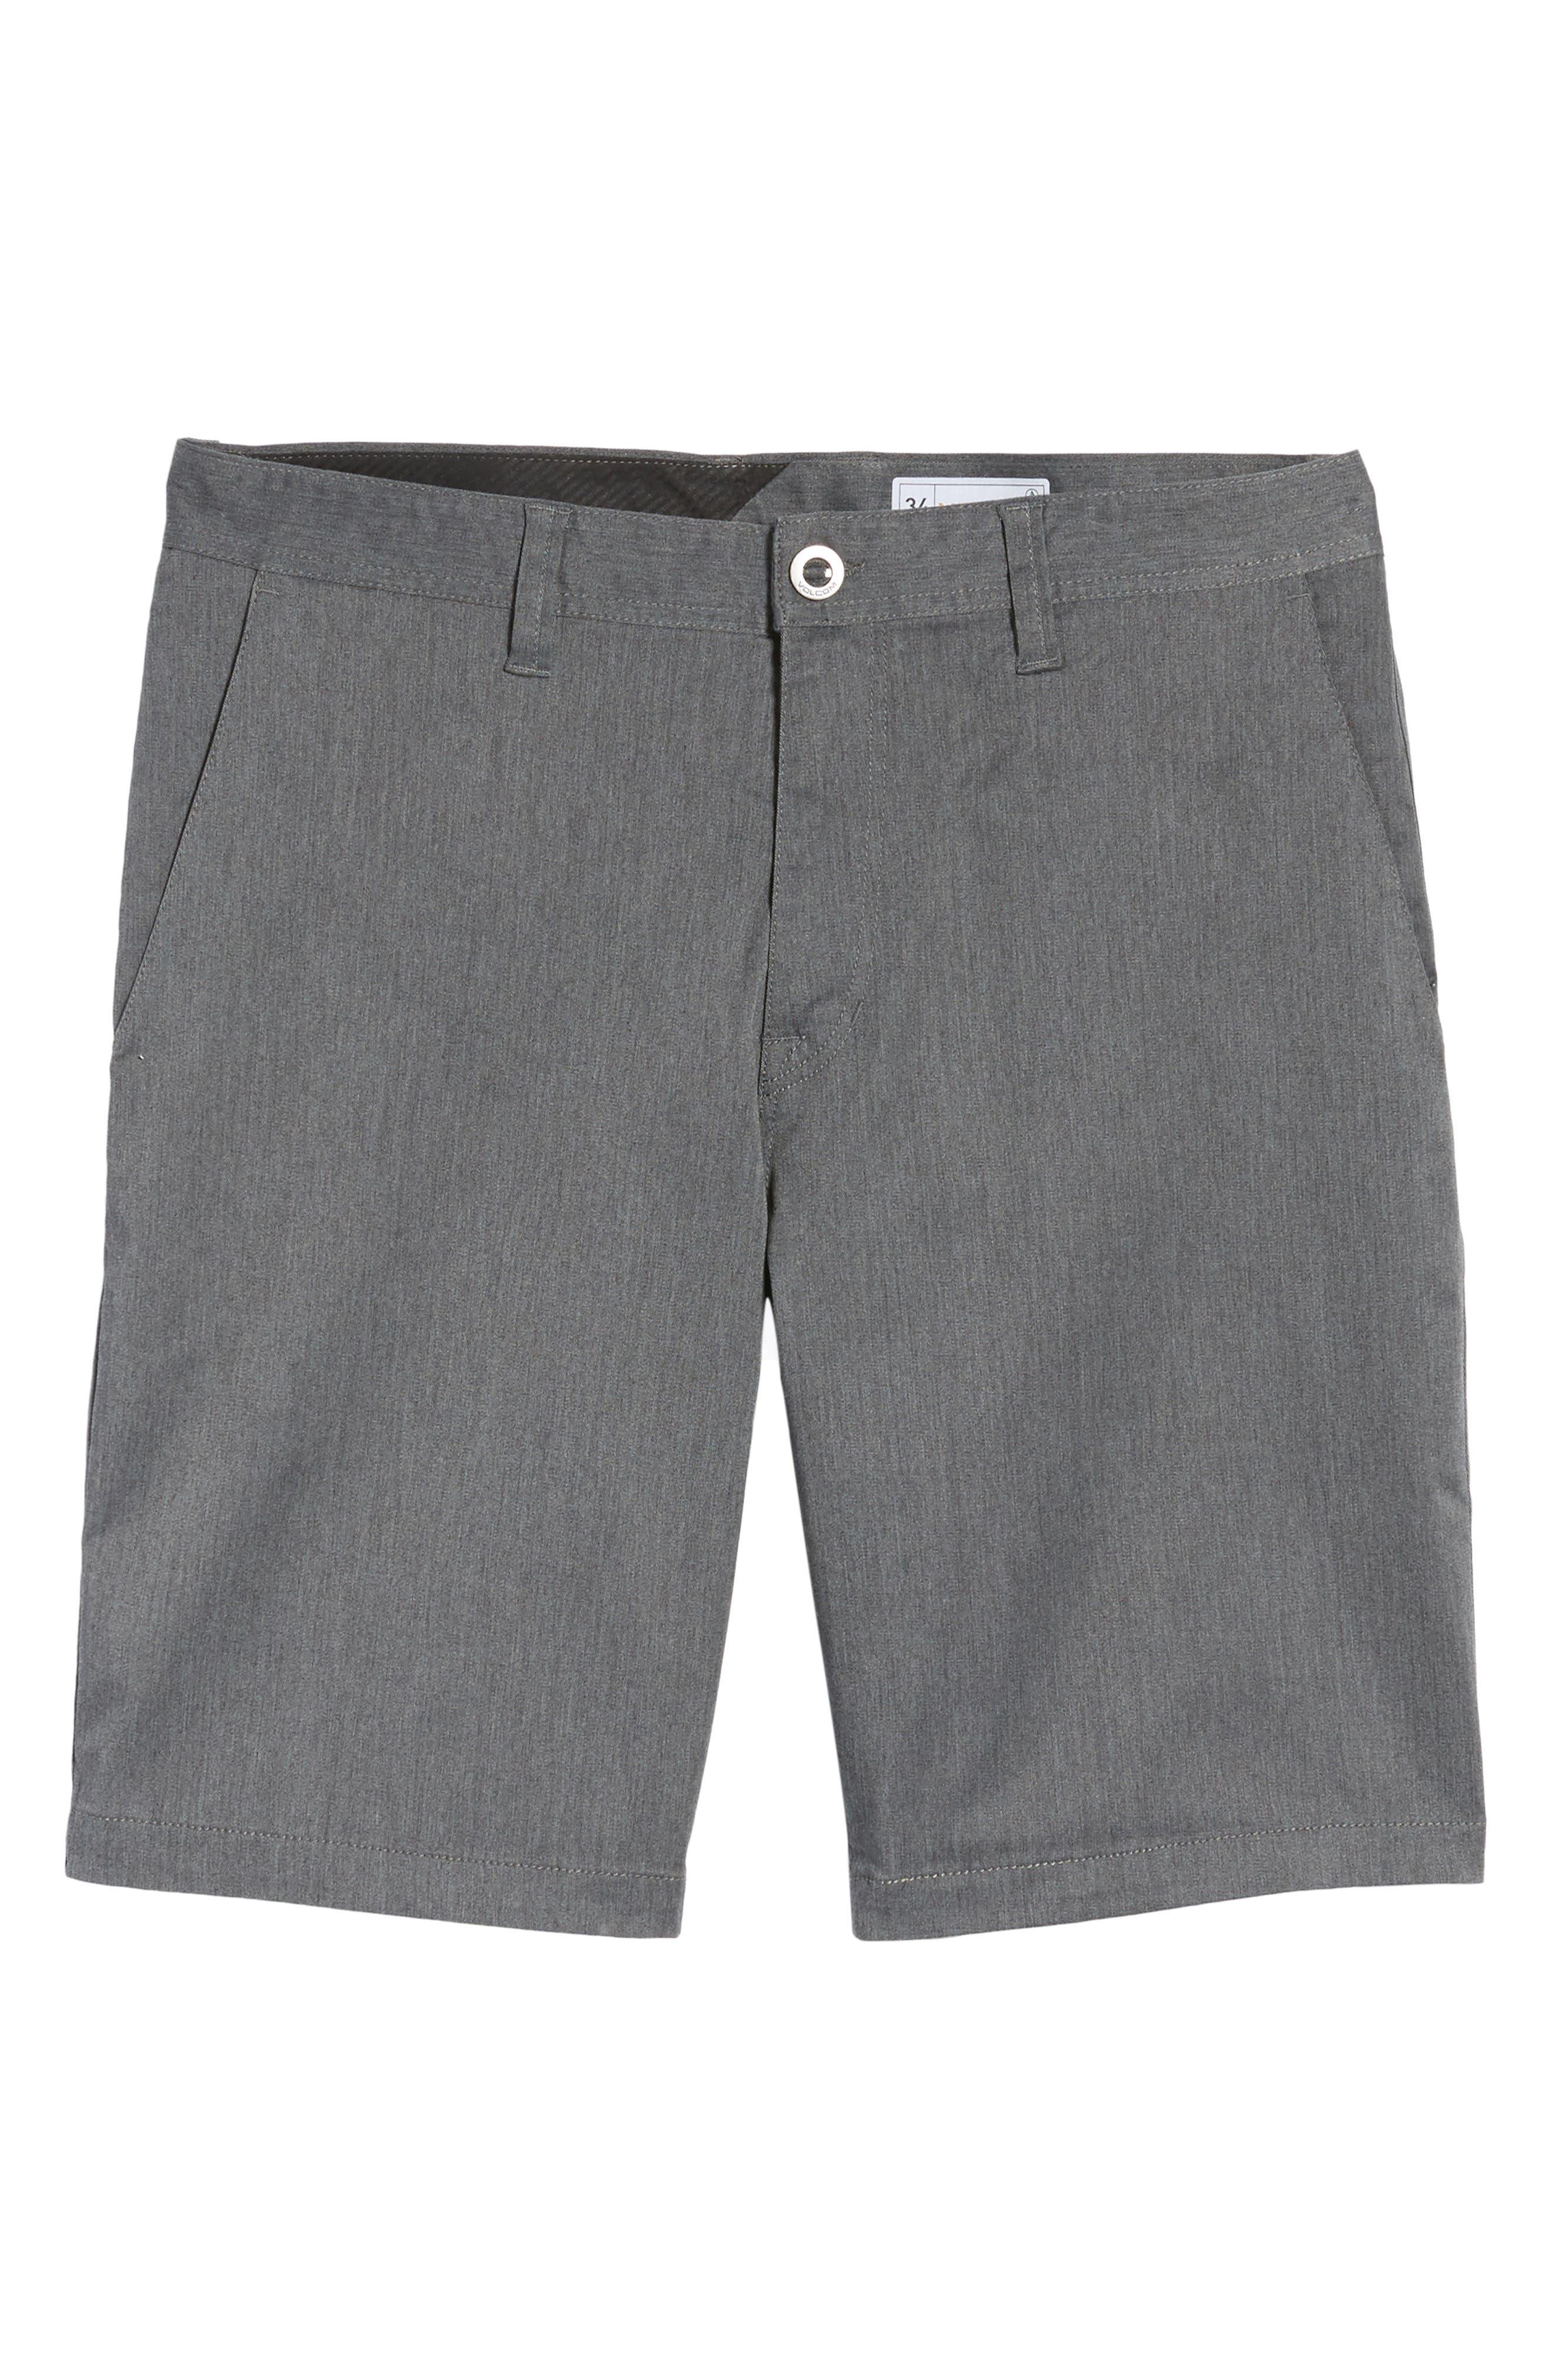 'Lightweight' Shorts,                             Main thumbnail 1, color,                             016